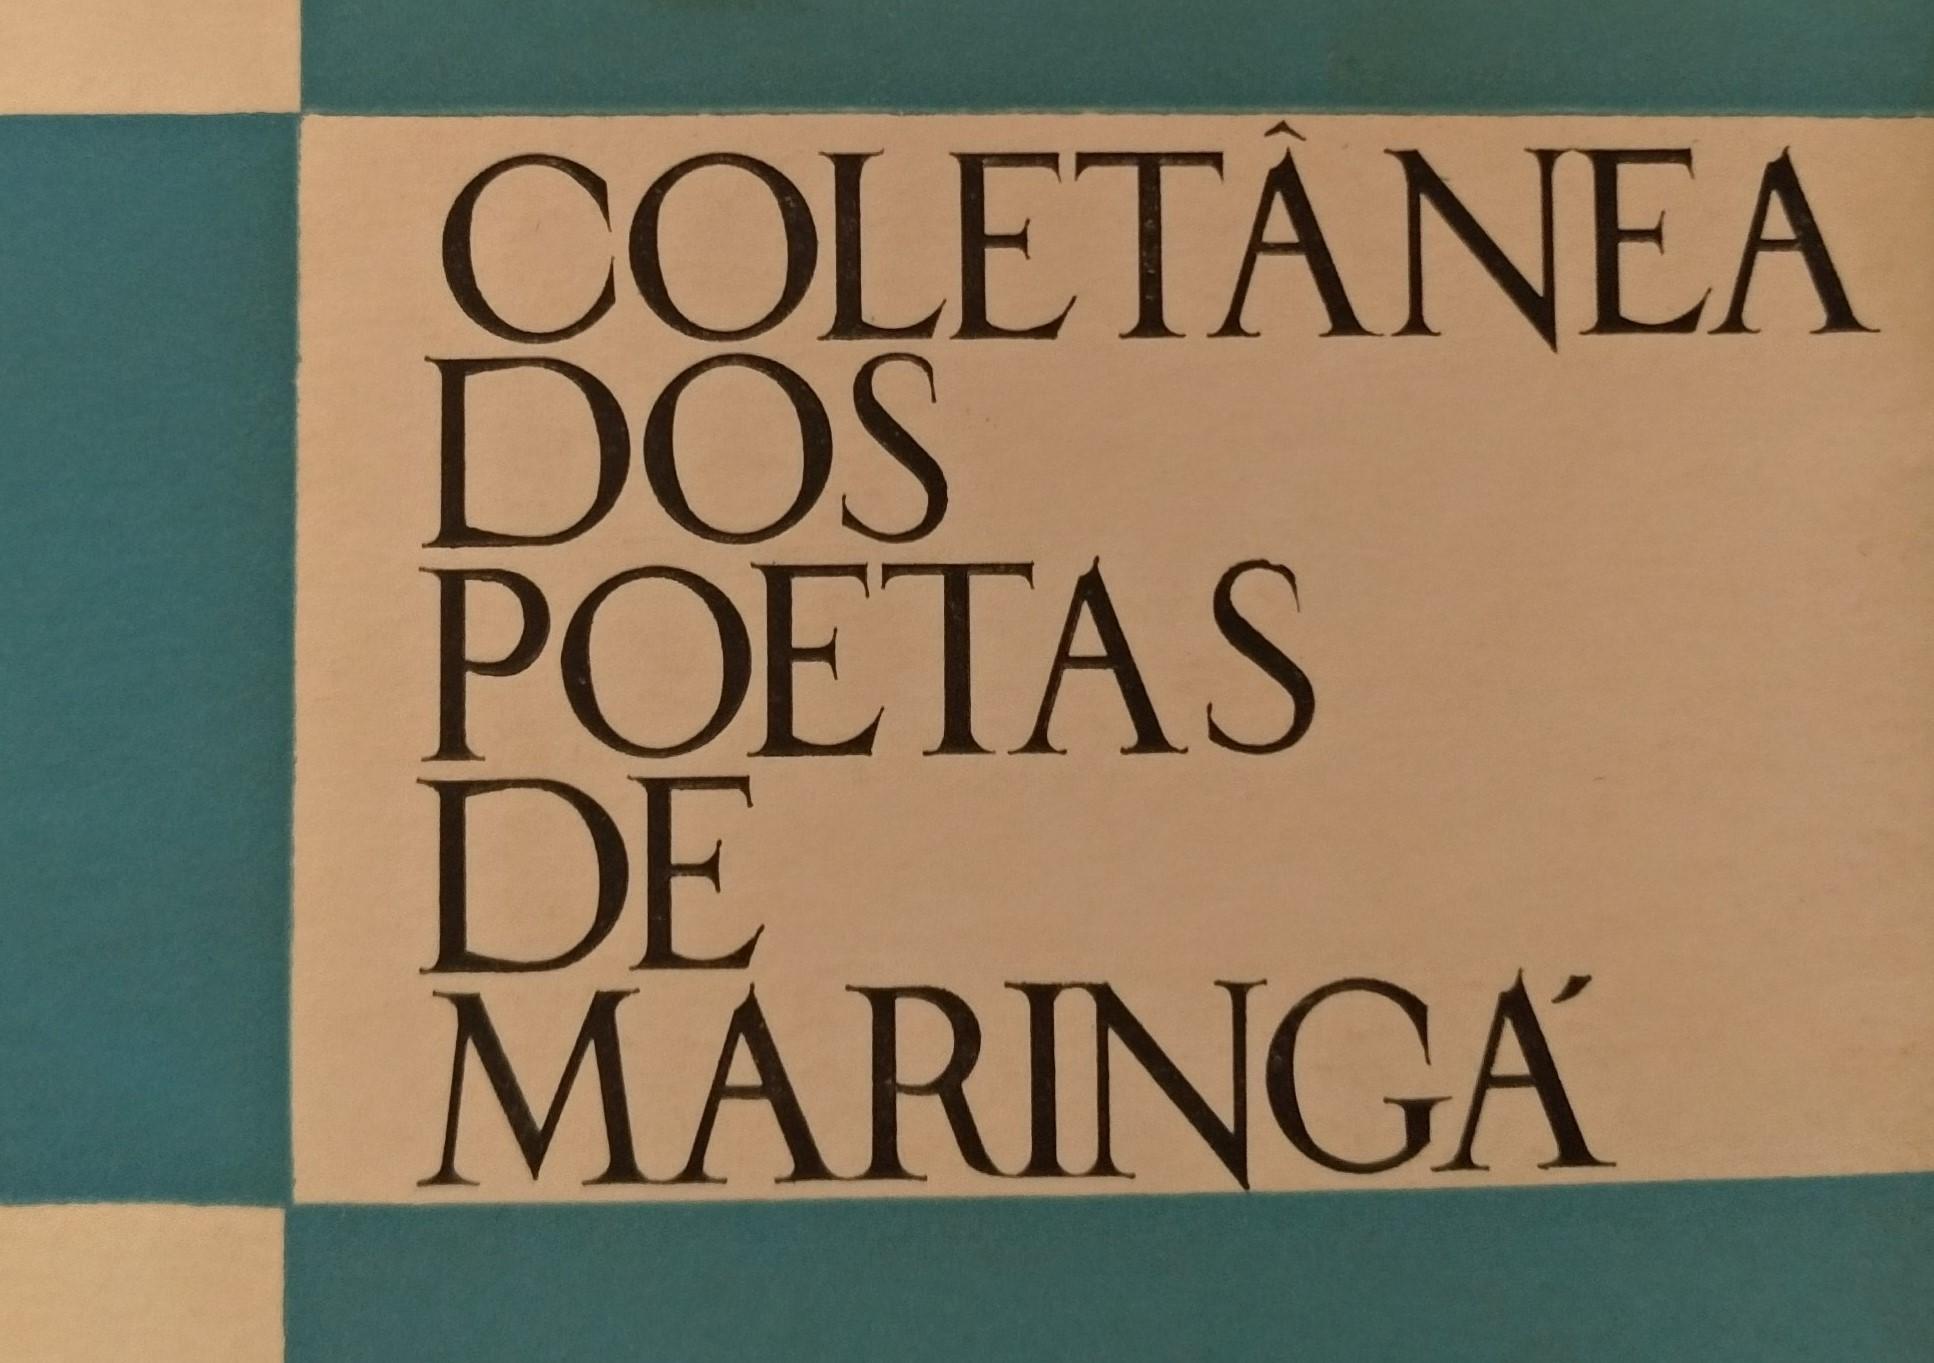 Coletânea dos Poetas de Maringá - 1966